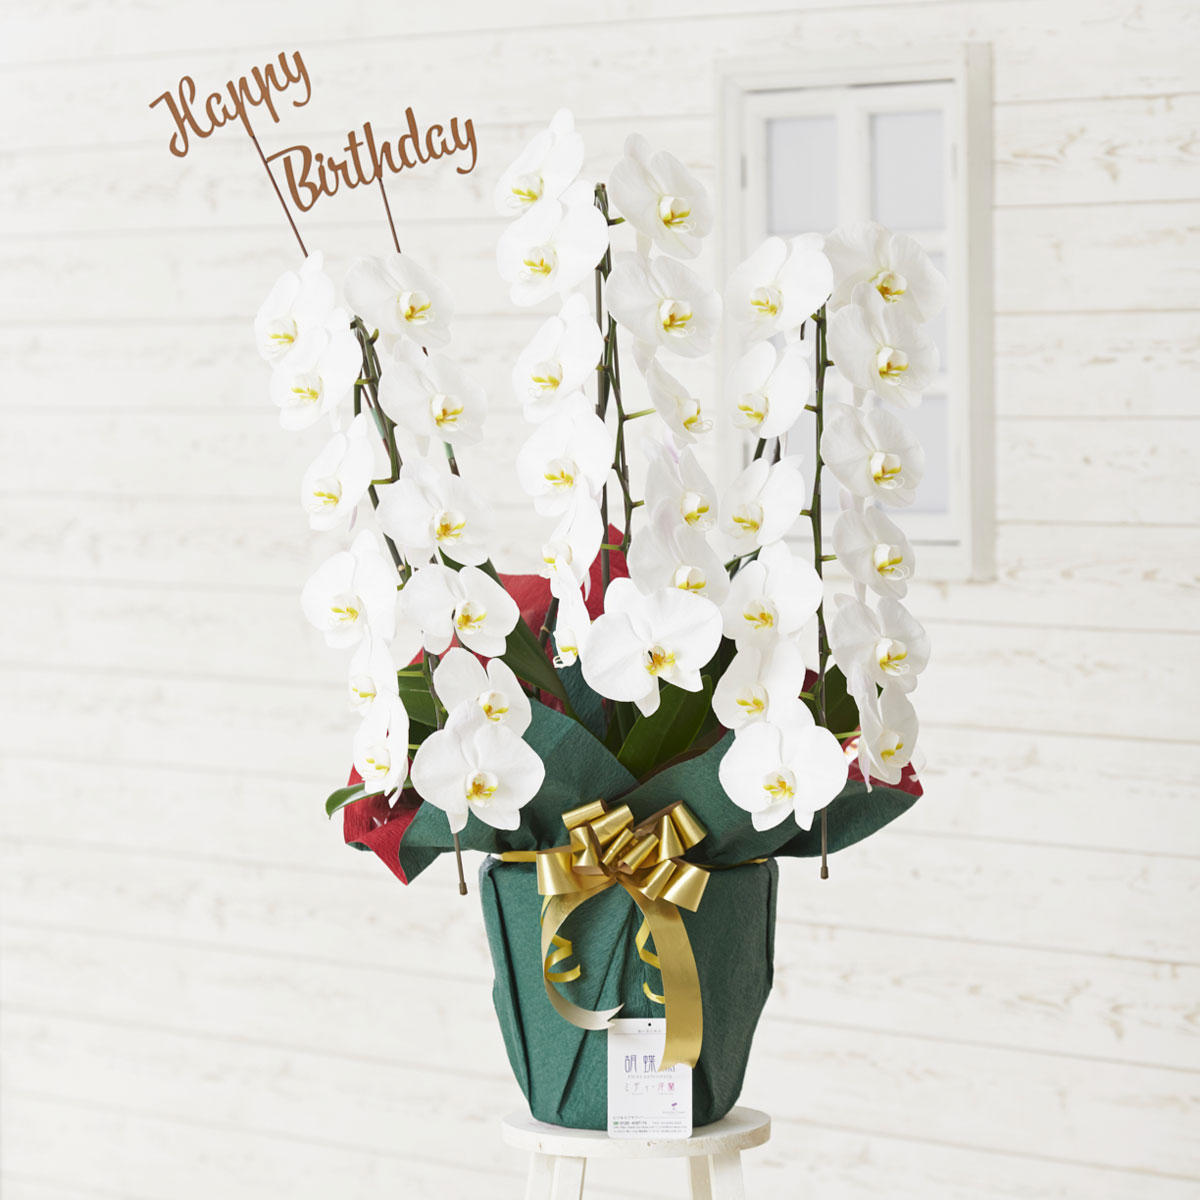 <p>胡蝶蘭に3D立体メッセージ札[Happy Birthday(文字型)]を付けたイメージ</p>